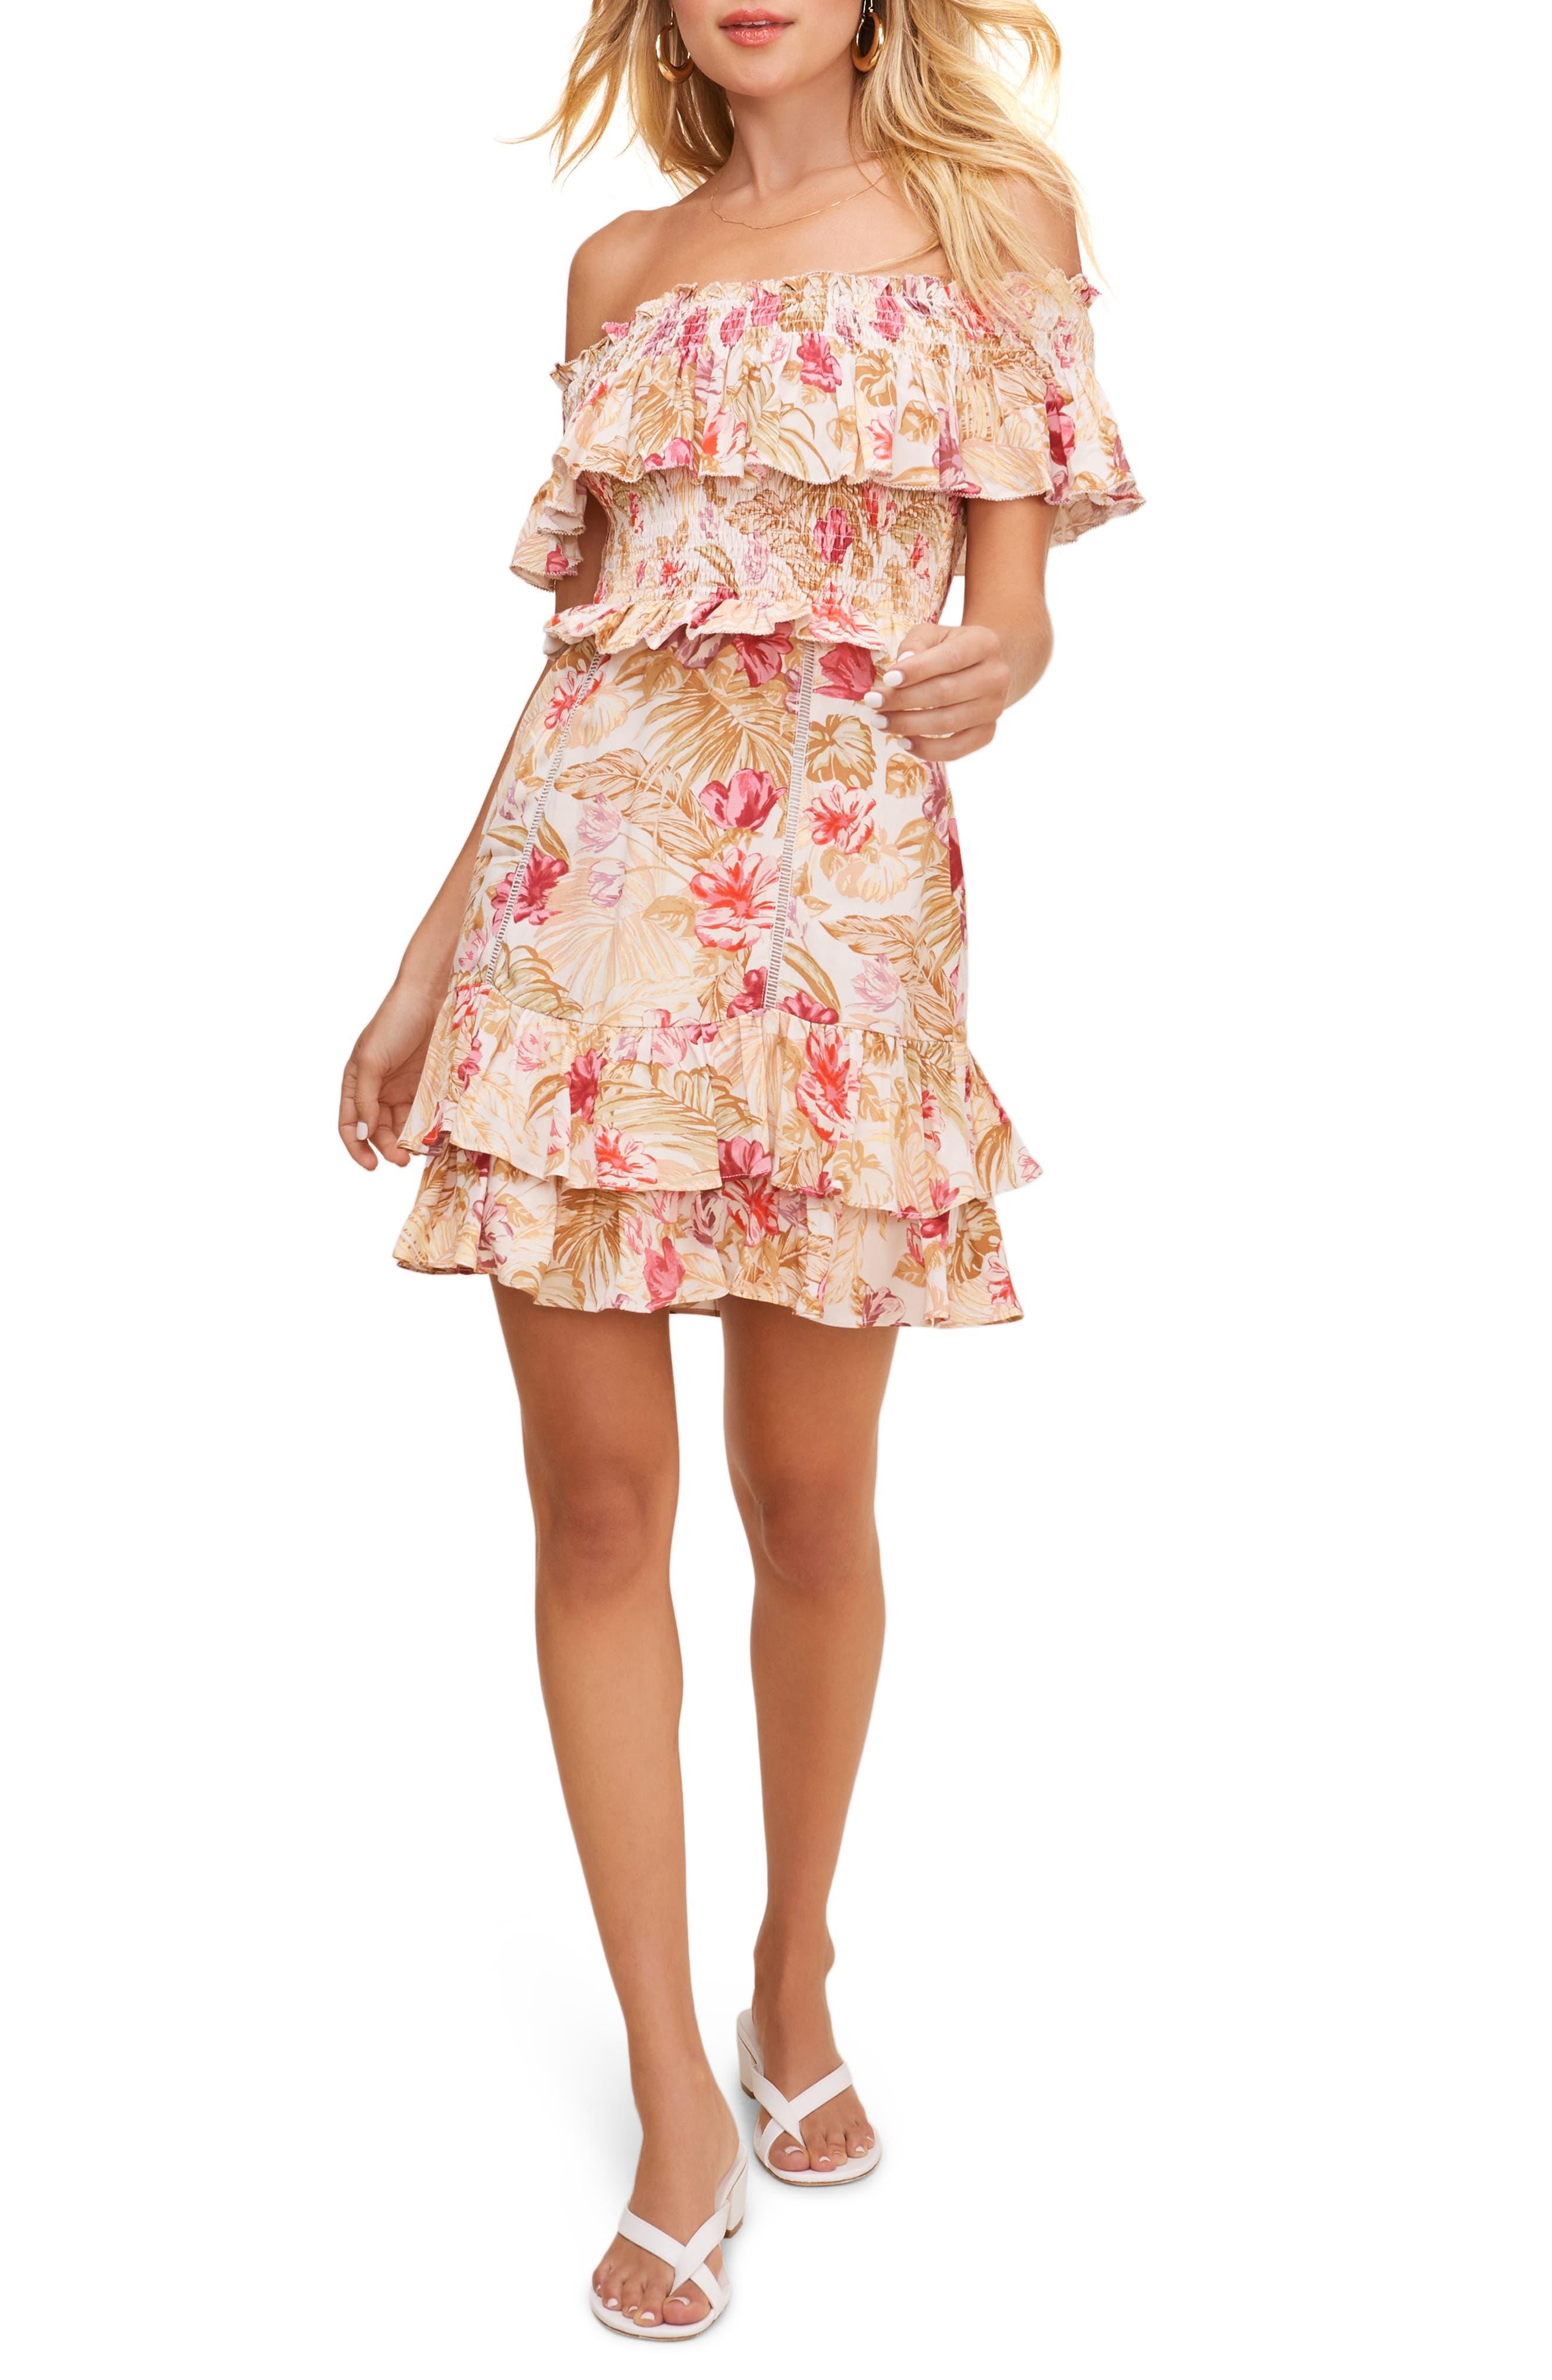 Riviera Floral Off The Shoulder Minidress